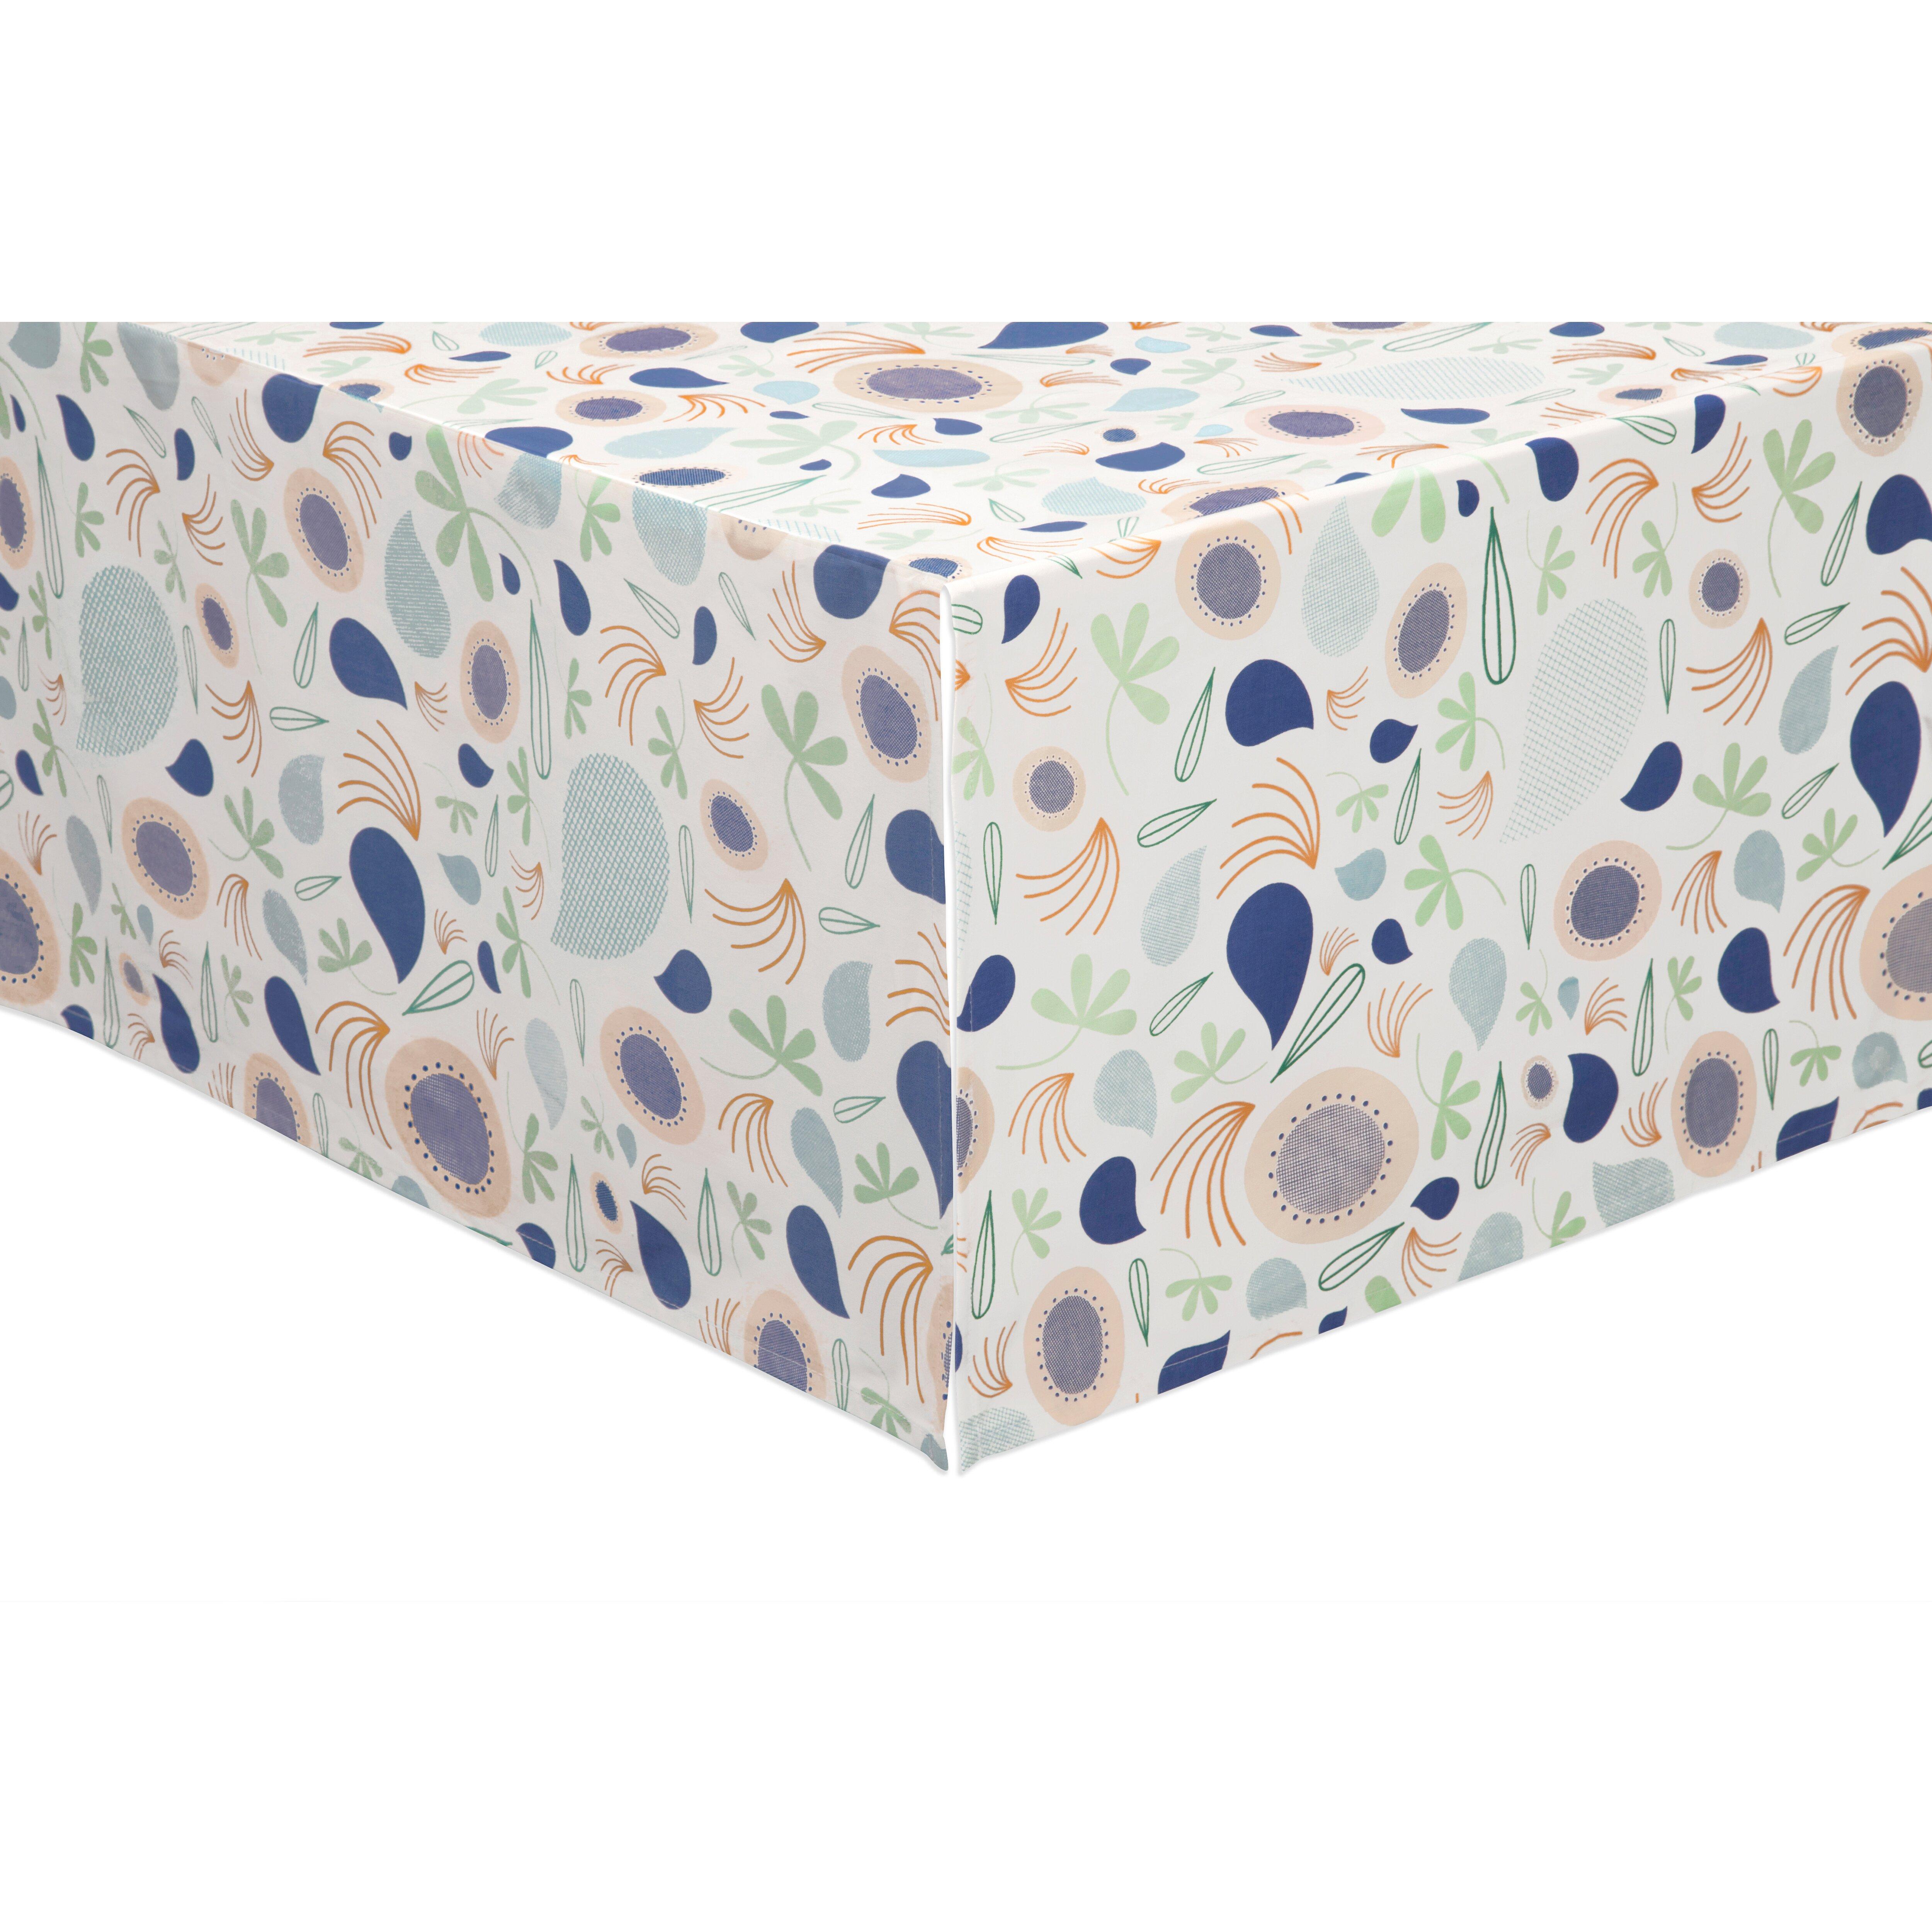 Crib for sale gatineau - Babyletto Fleeting Flora 6 Piece Crib Bedding Set